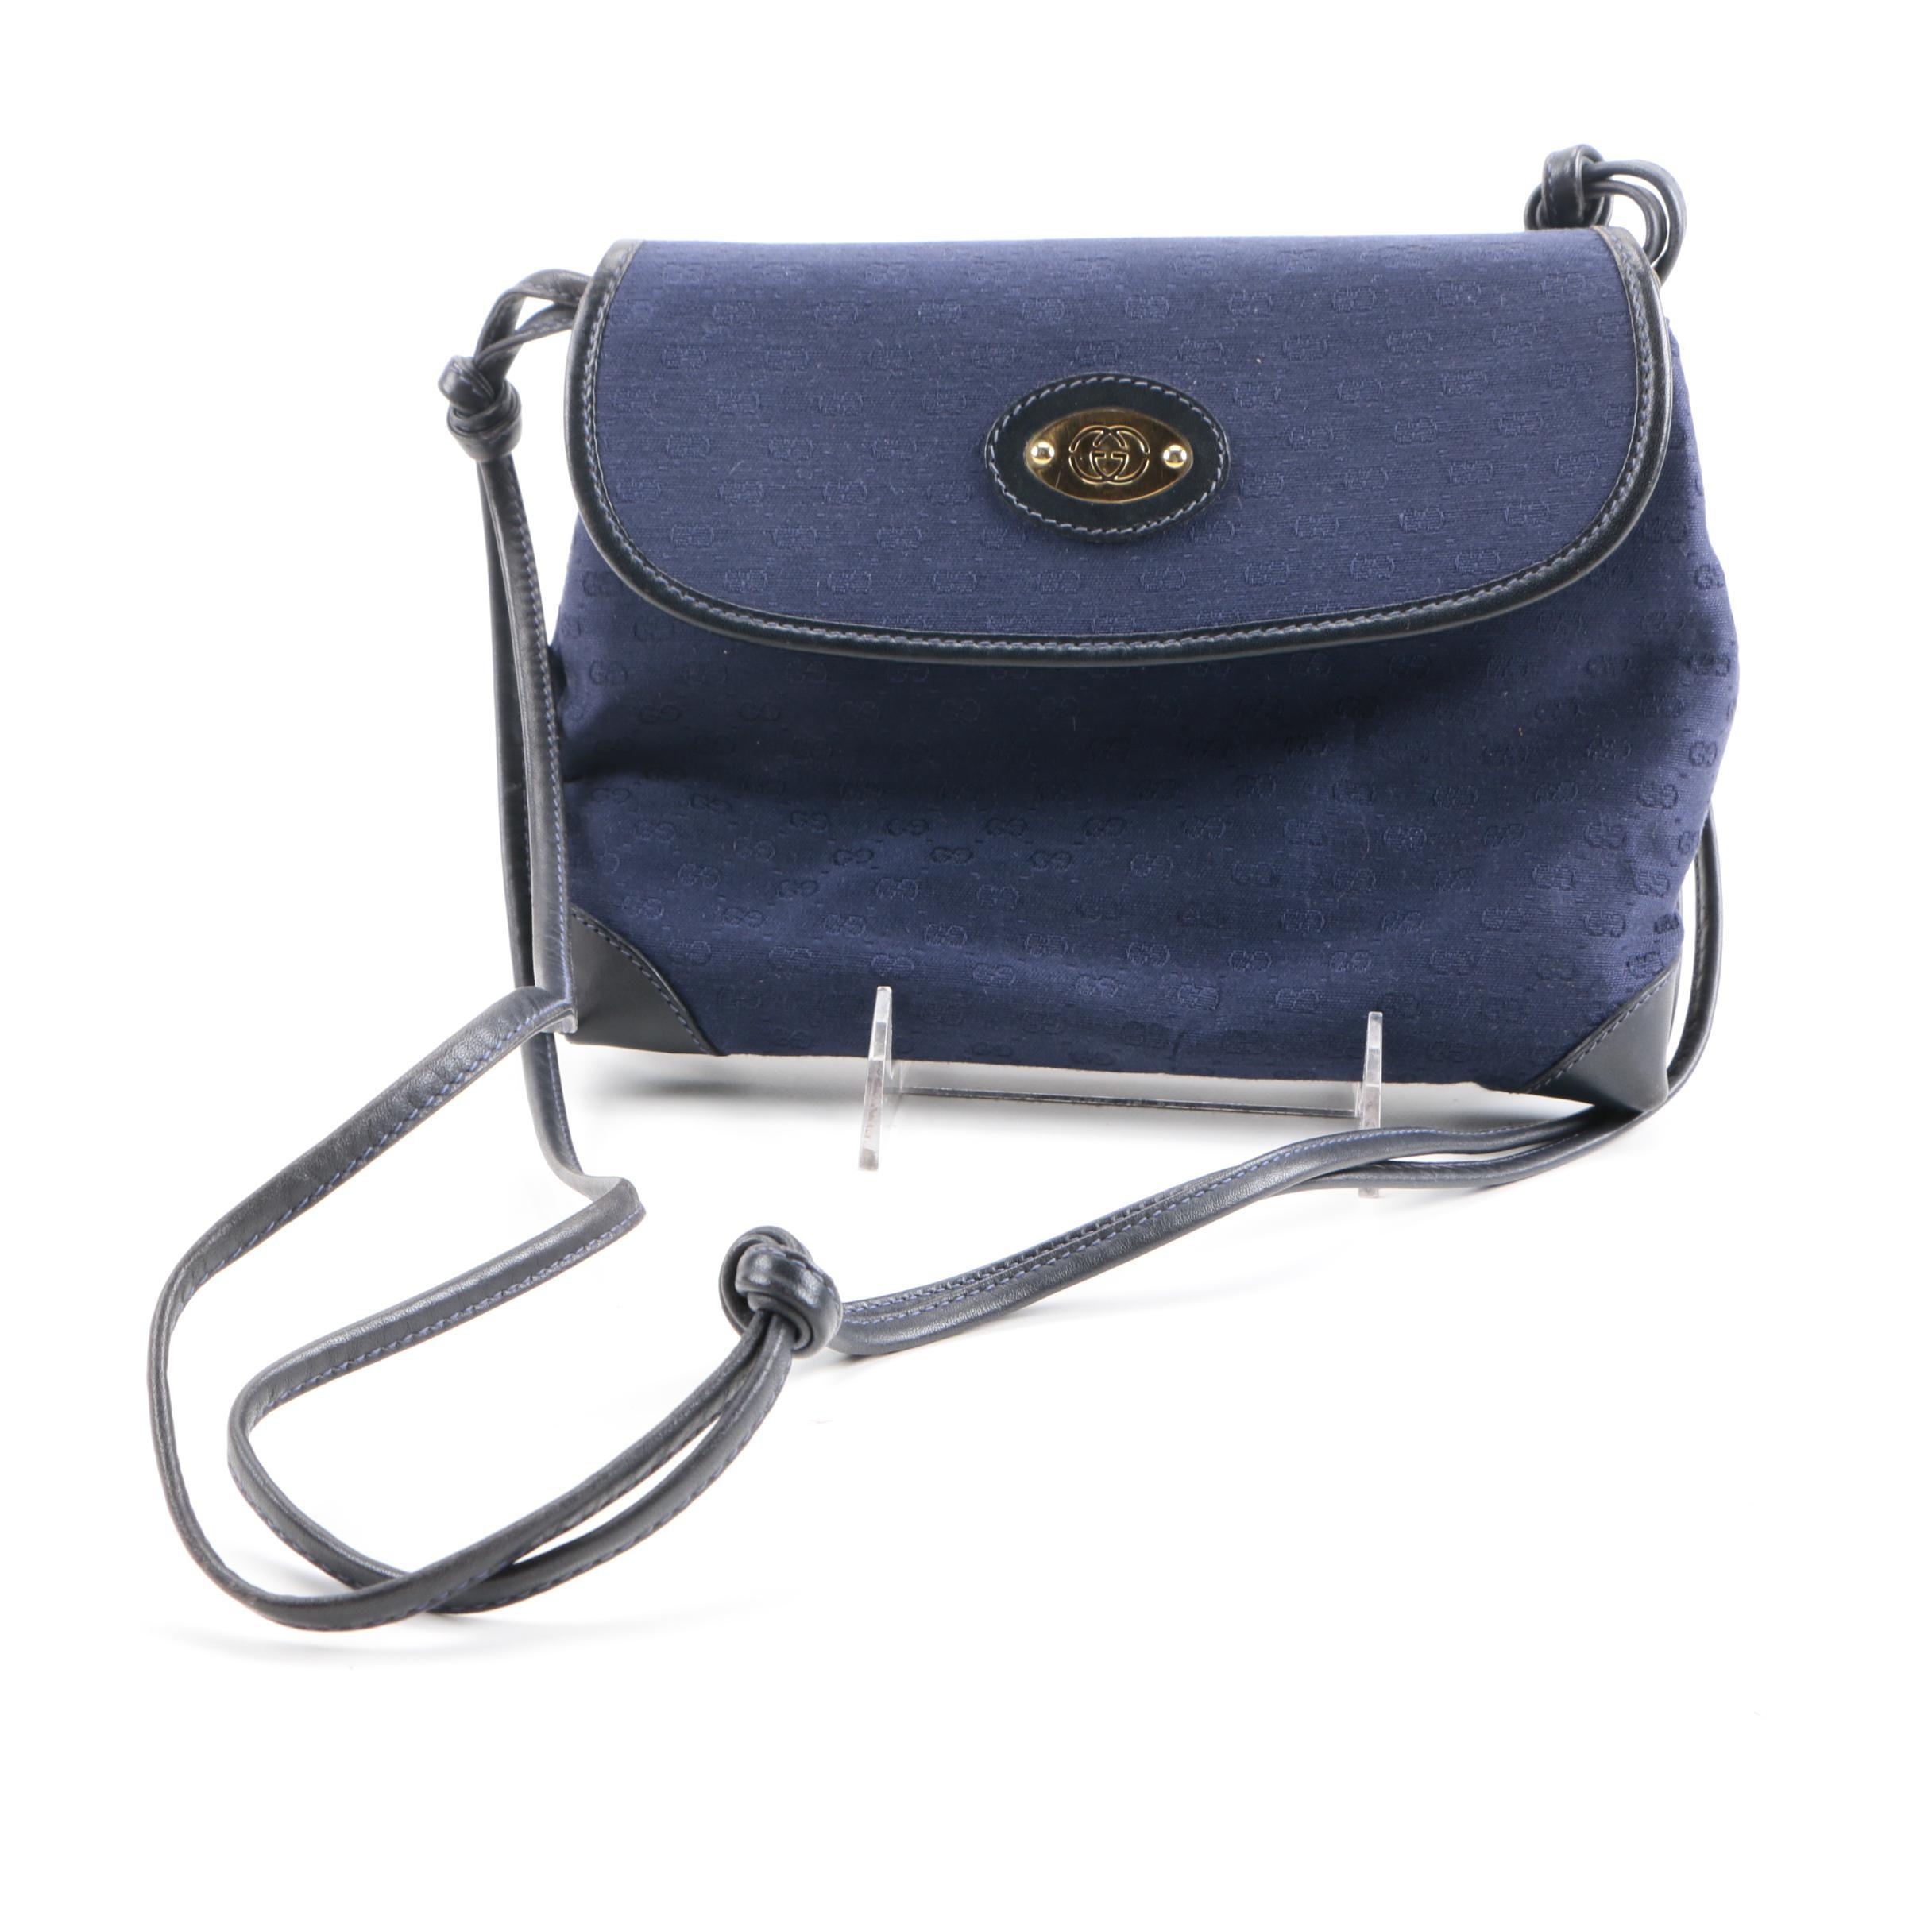 Gucci Blue Monogrammed Crossbody Bag